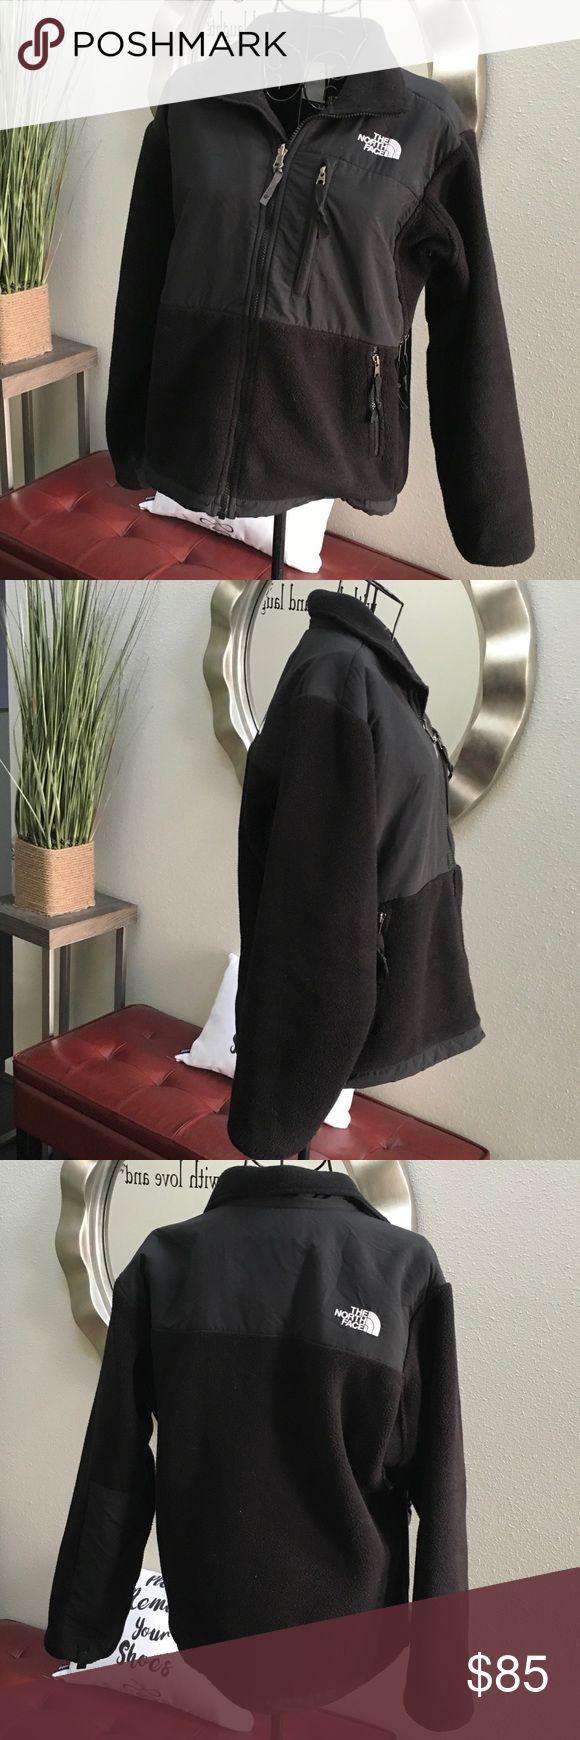 The North Face Black Woman's Denali Jacket The North Face Black Woman's Denali Jacket The North Face Jackets & Coats